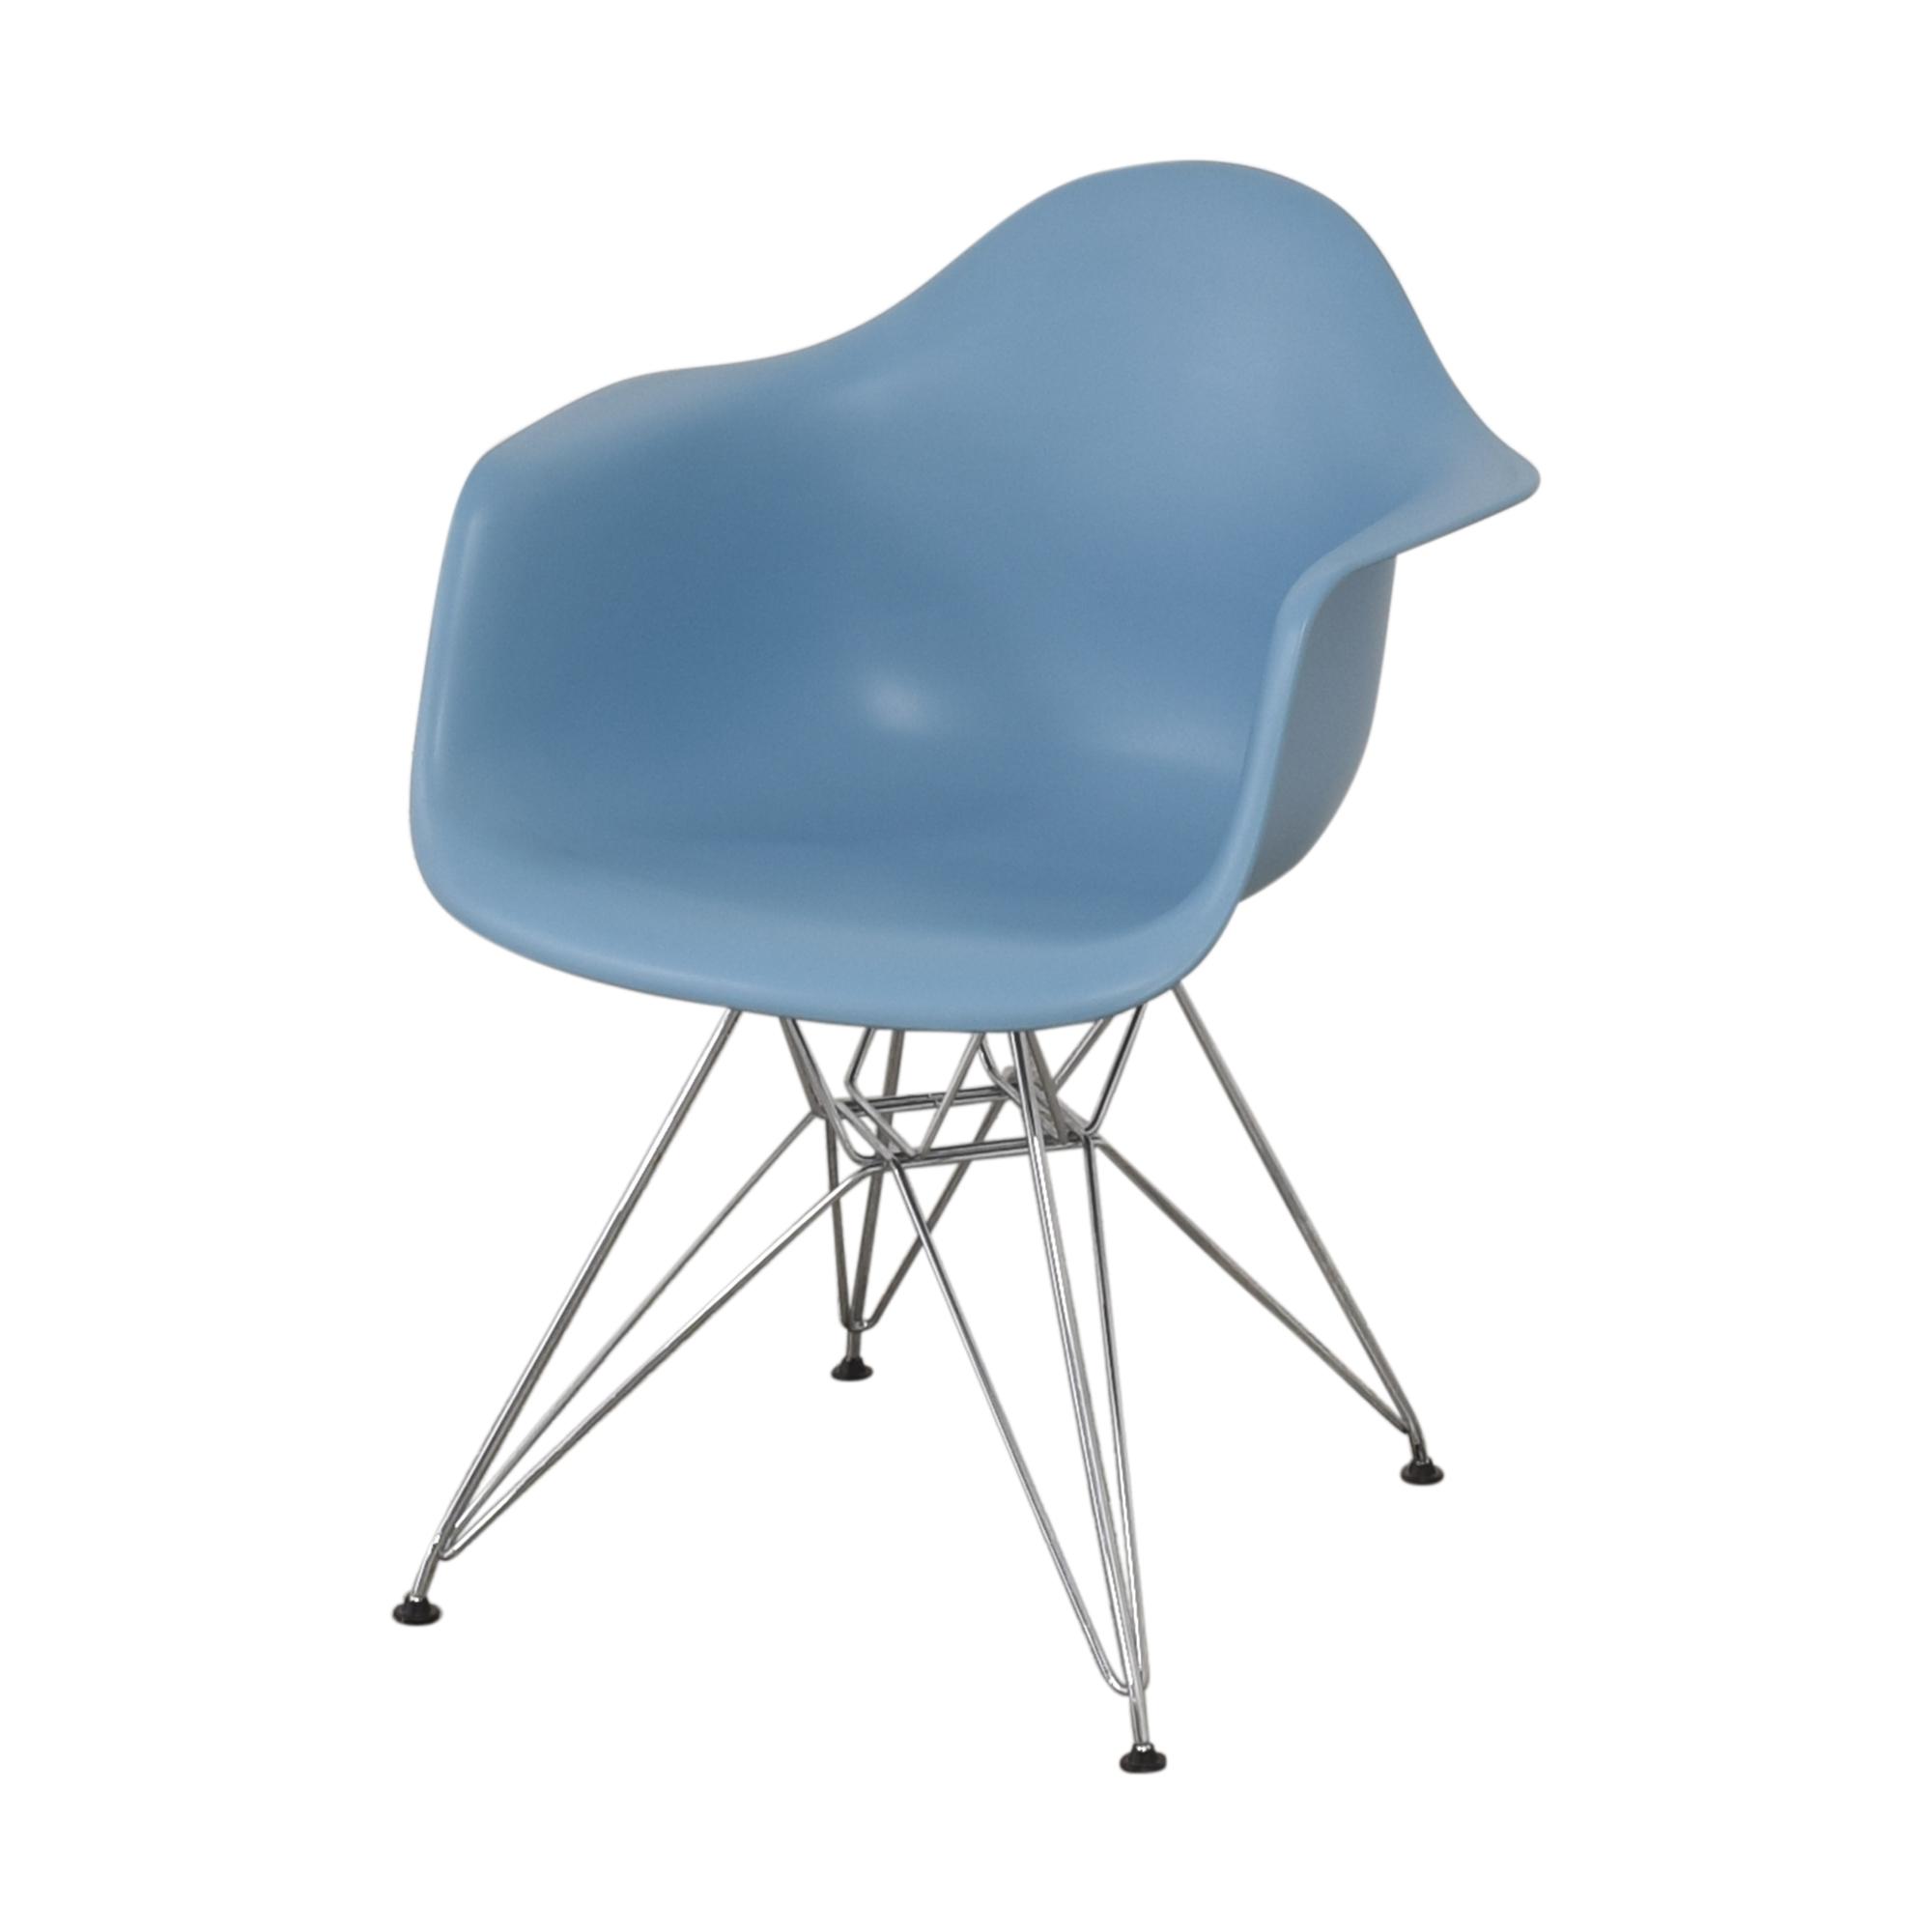 Herman Miller Herman Miller Eames Molded Armchairs ct